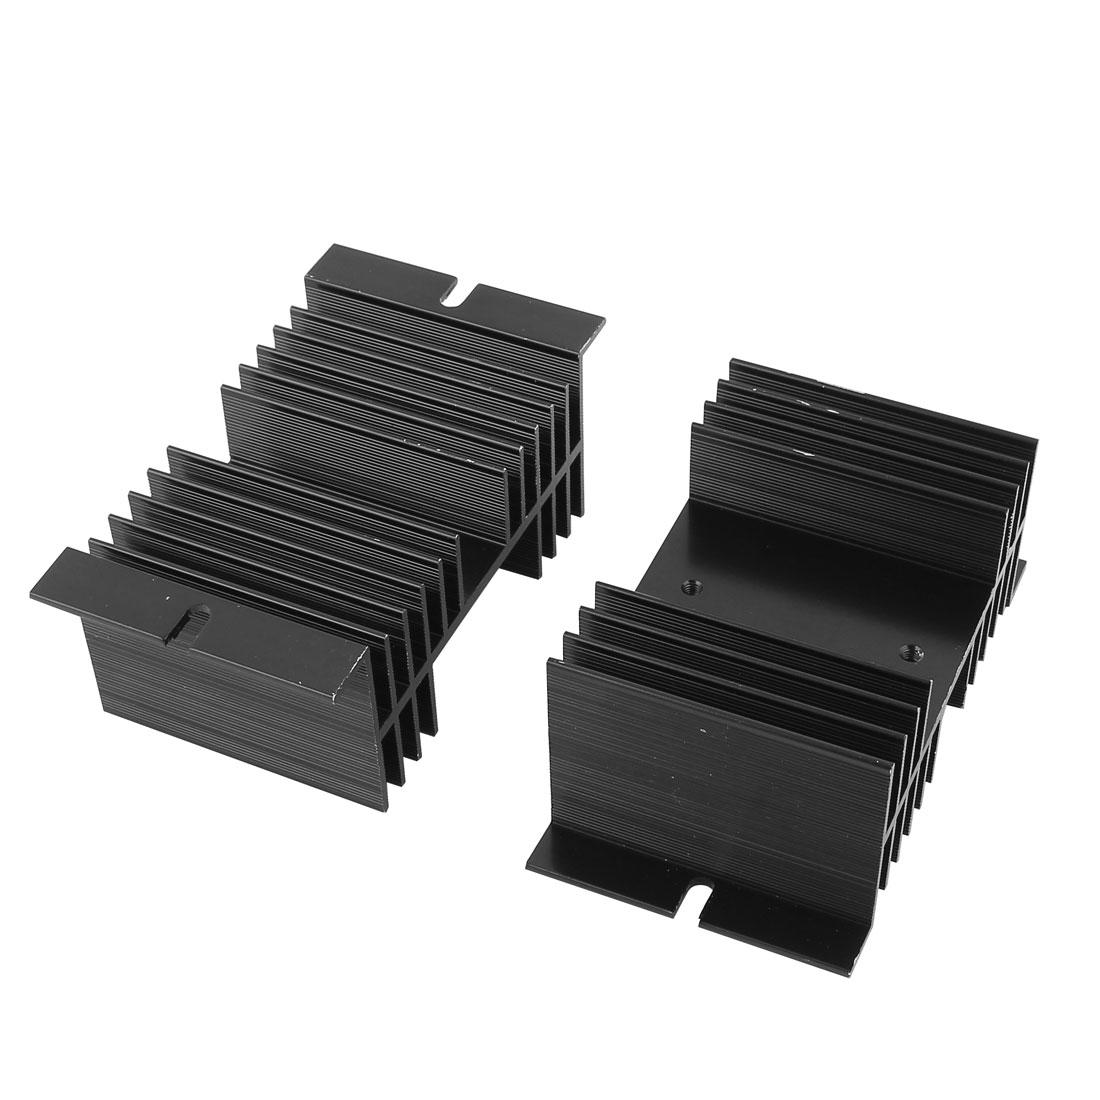 2pcs 10mmx5mmx7mm Black Aluminium Heat Dissipation Heatsink Cooling Fin Cooler Sink for SSR Solid State Relay